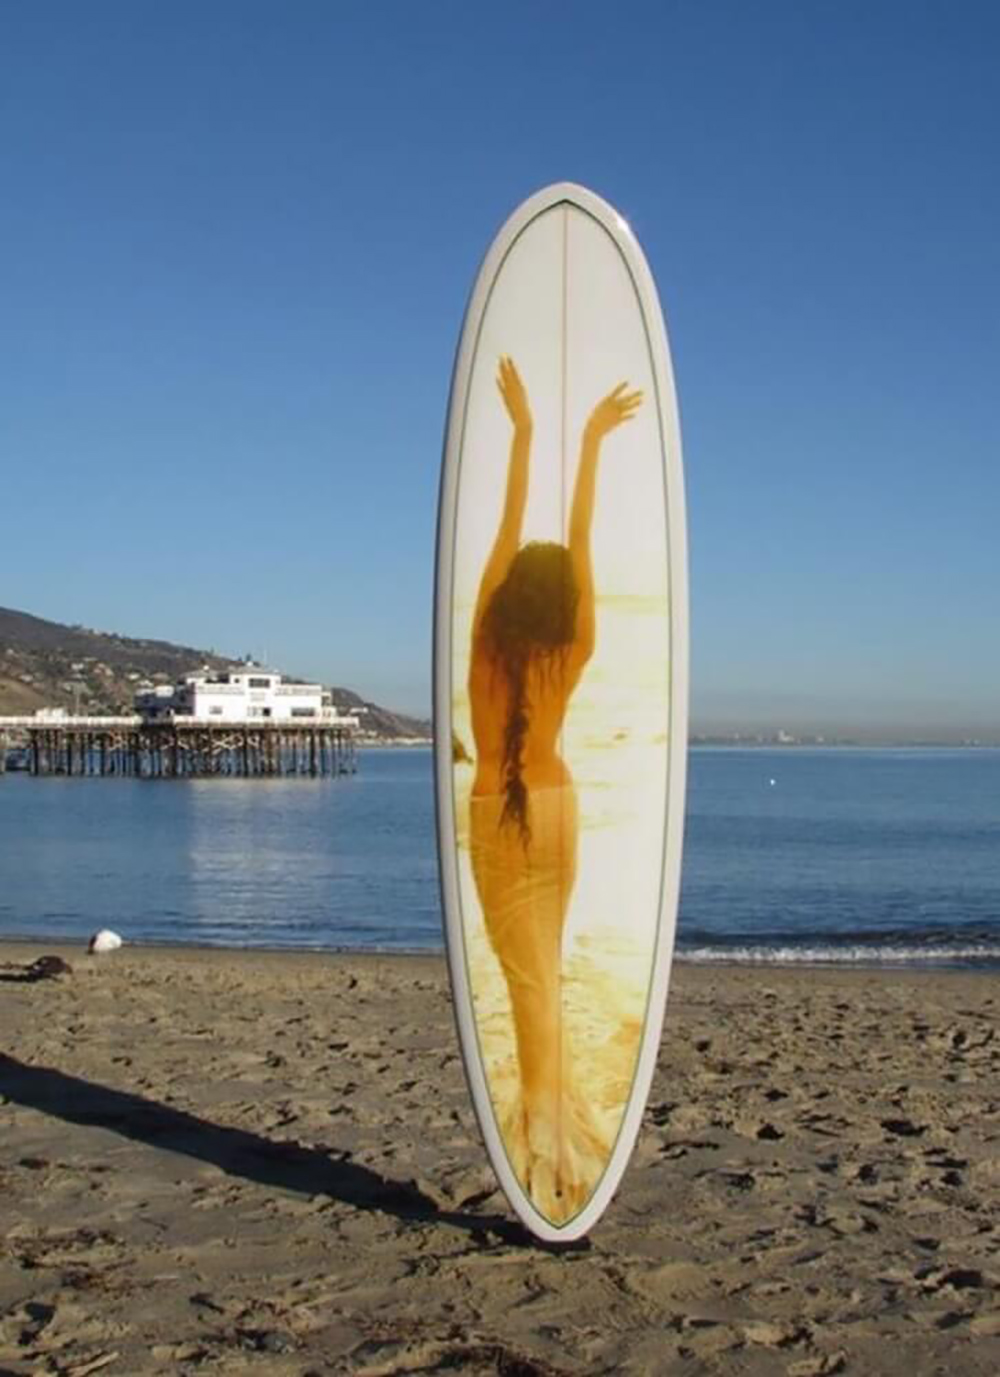 surfboard on beach.jpg